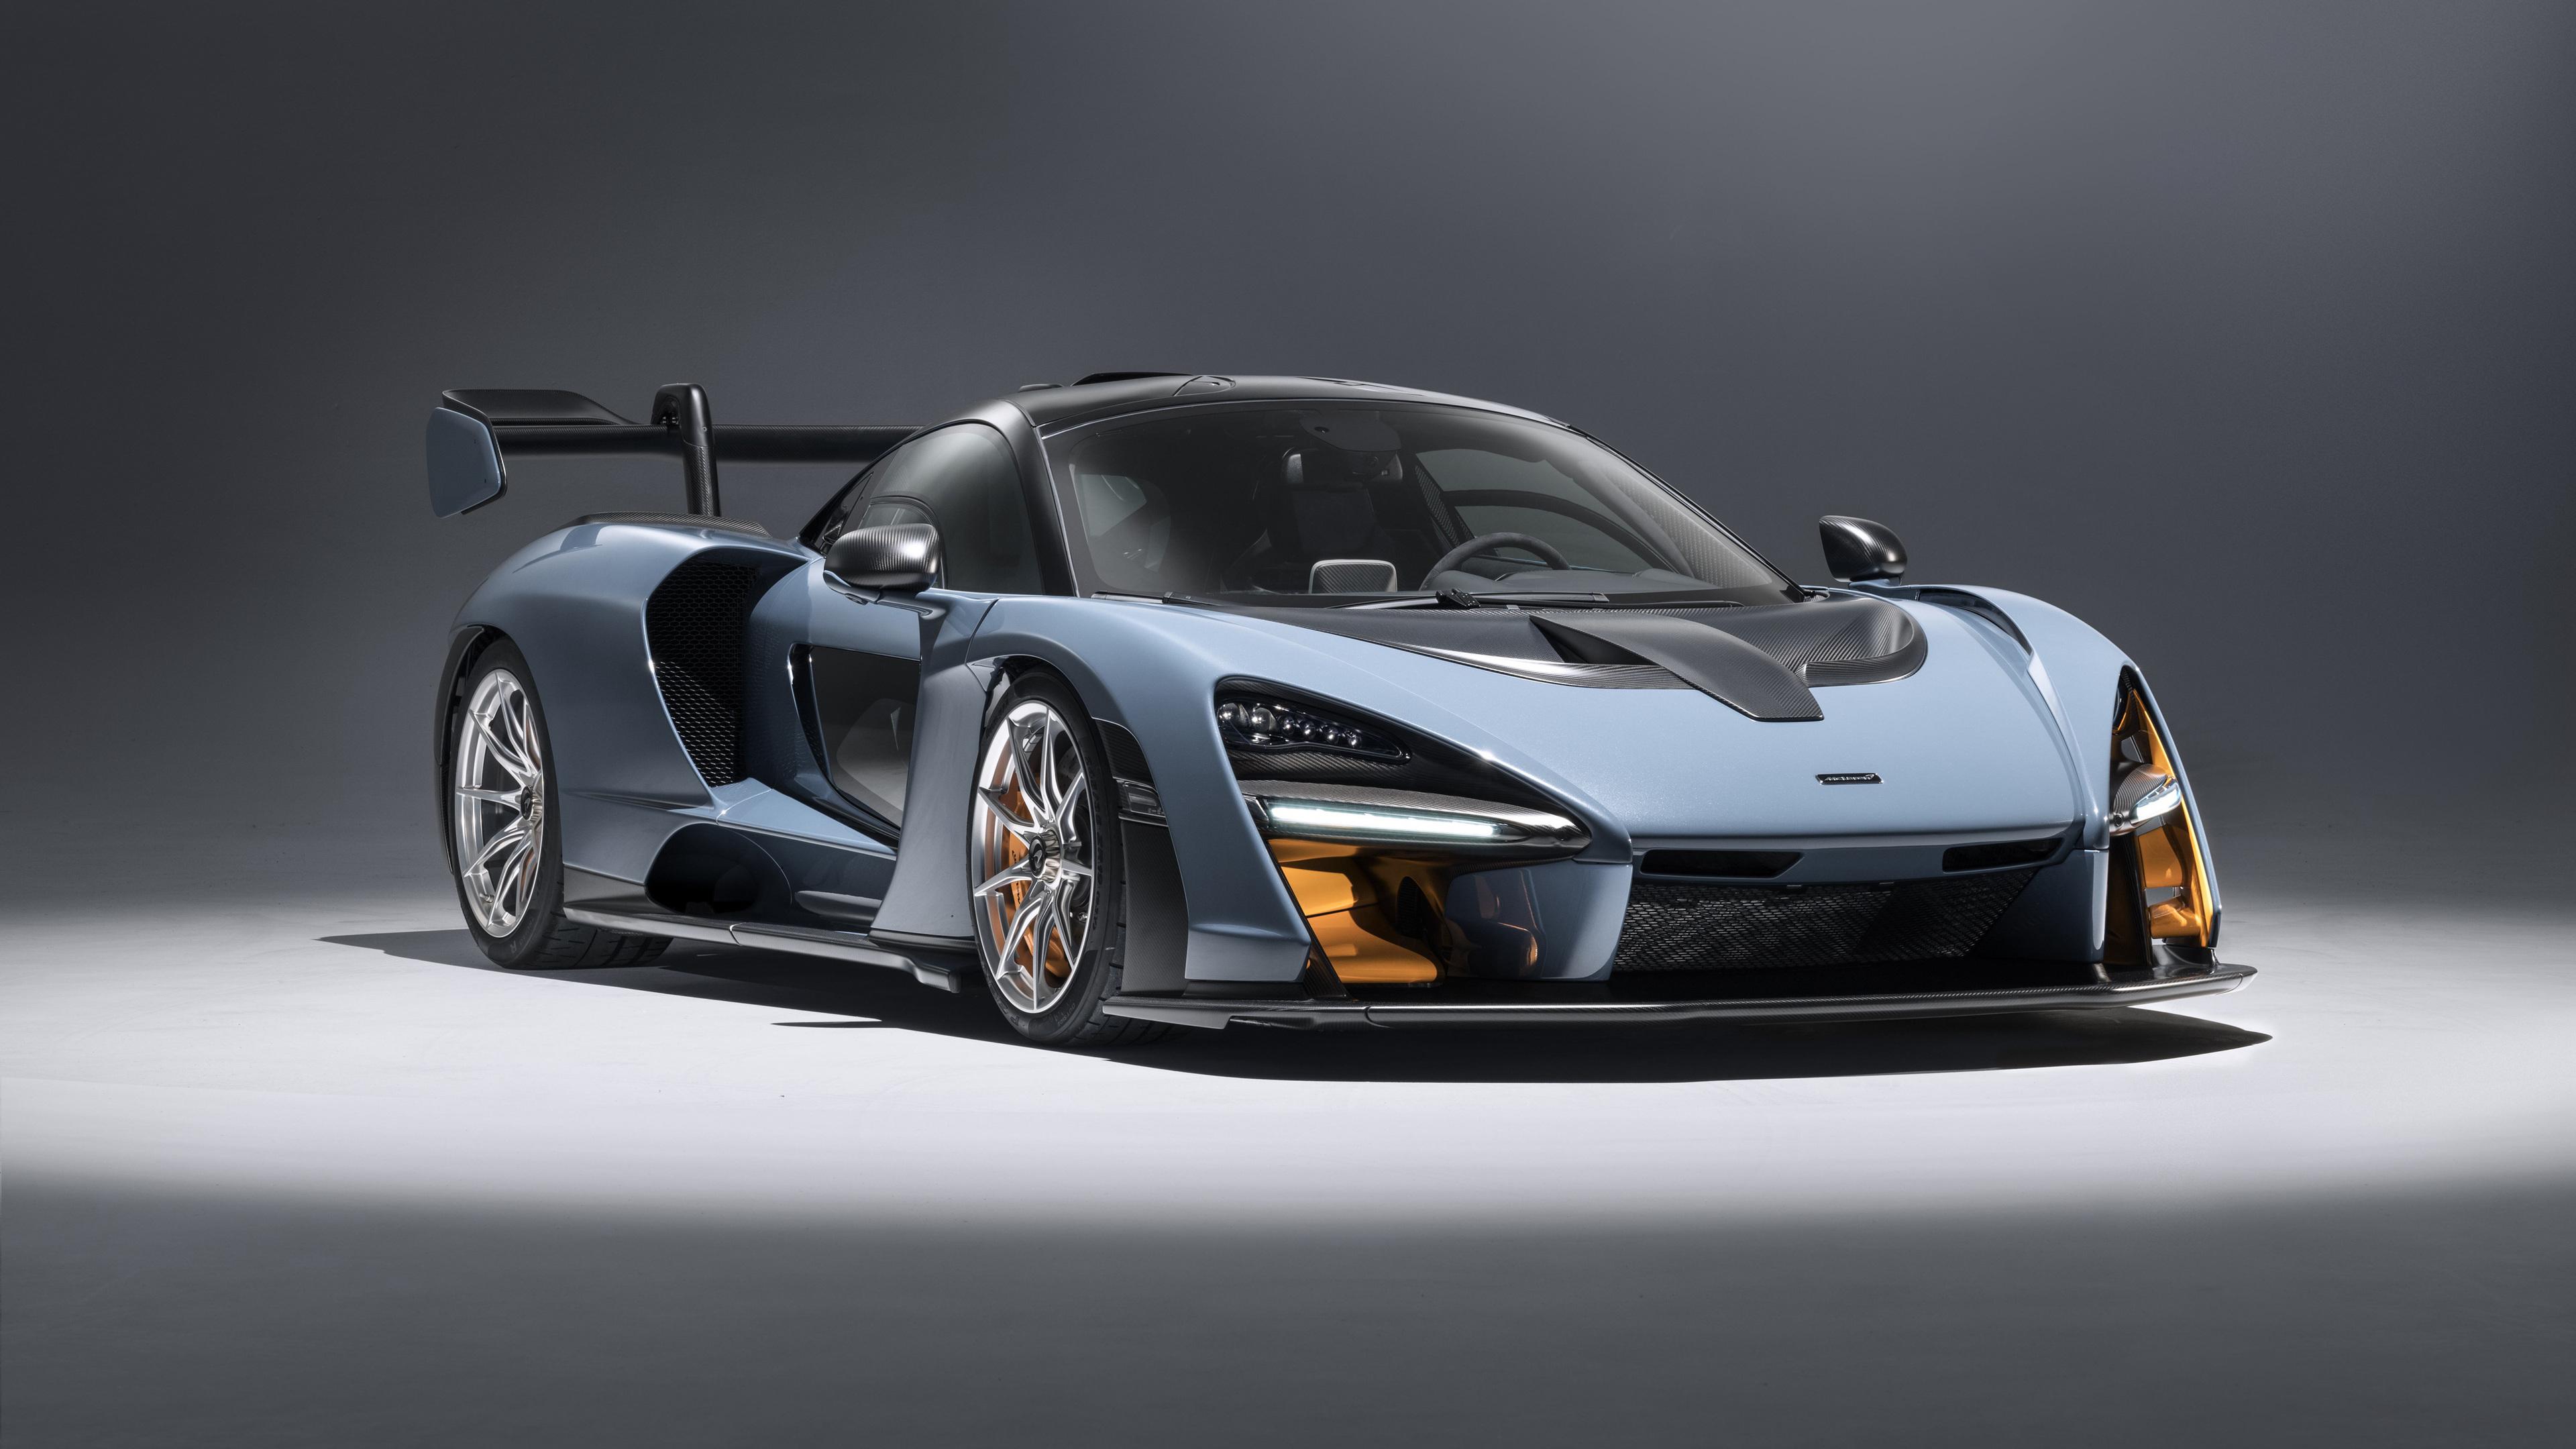 2018 mclaren senna 4k 1539109351 - 2018 McLaren Senna 4k - mclaren wallpapers, mclaren senna wallpapers, hd-wallpapers, cars wallpapers, 4k-wallpapers, 2018 cars wallpapers